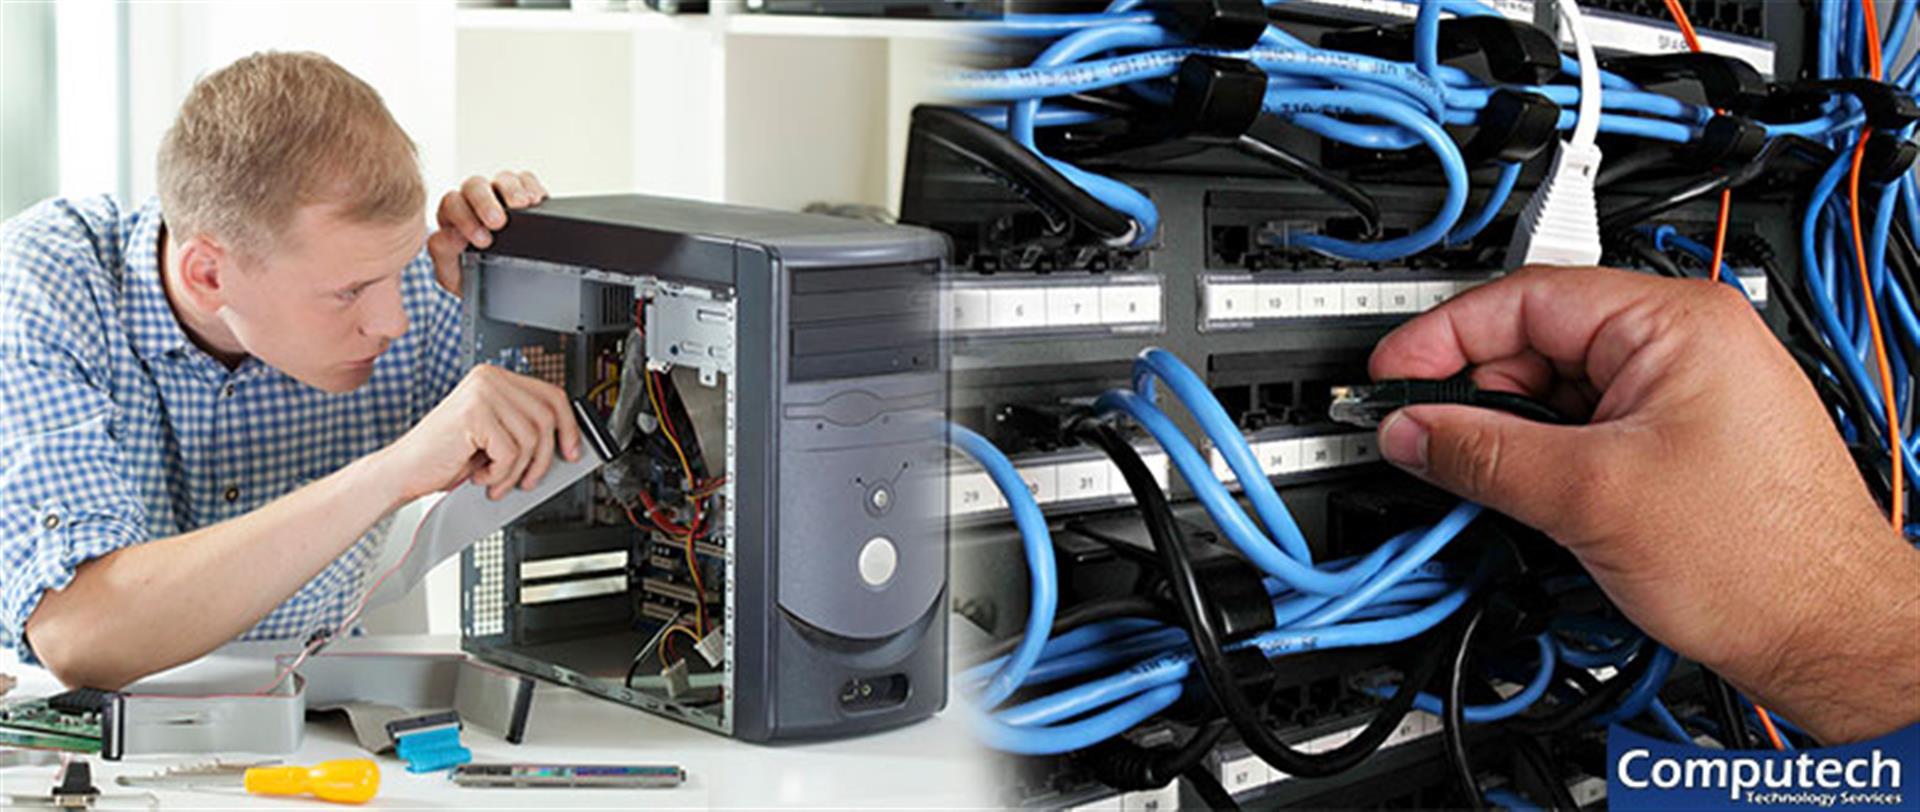 Guntersville Alabama On Site Computer & Printer Repair, Networking, Telecom & Data Low Voltage Cabling Services